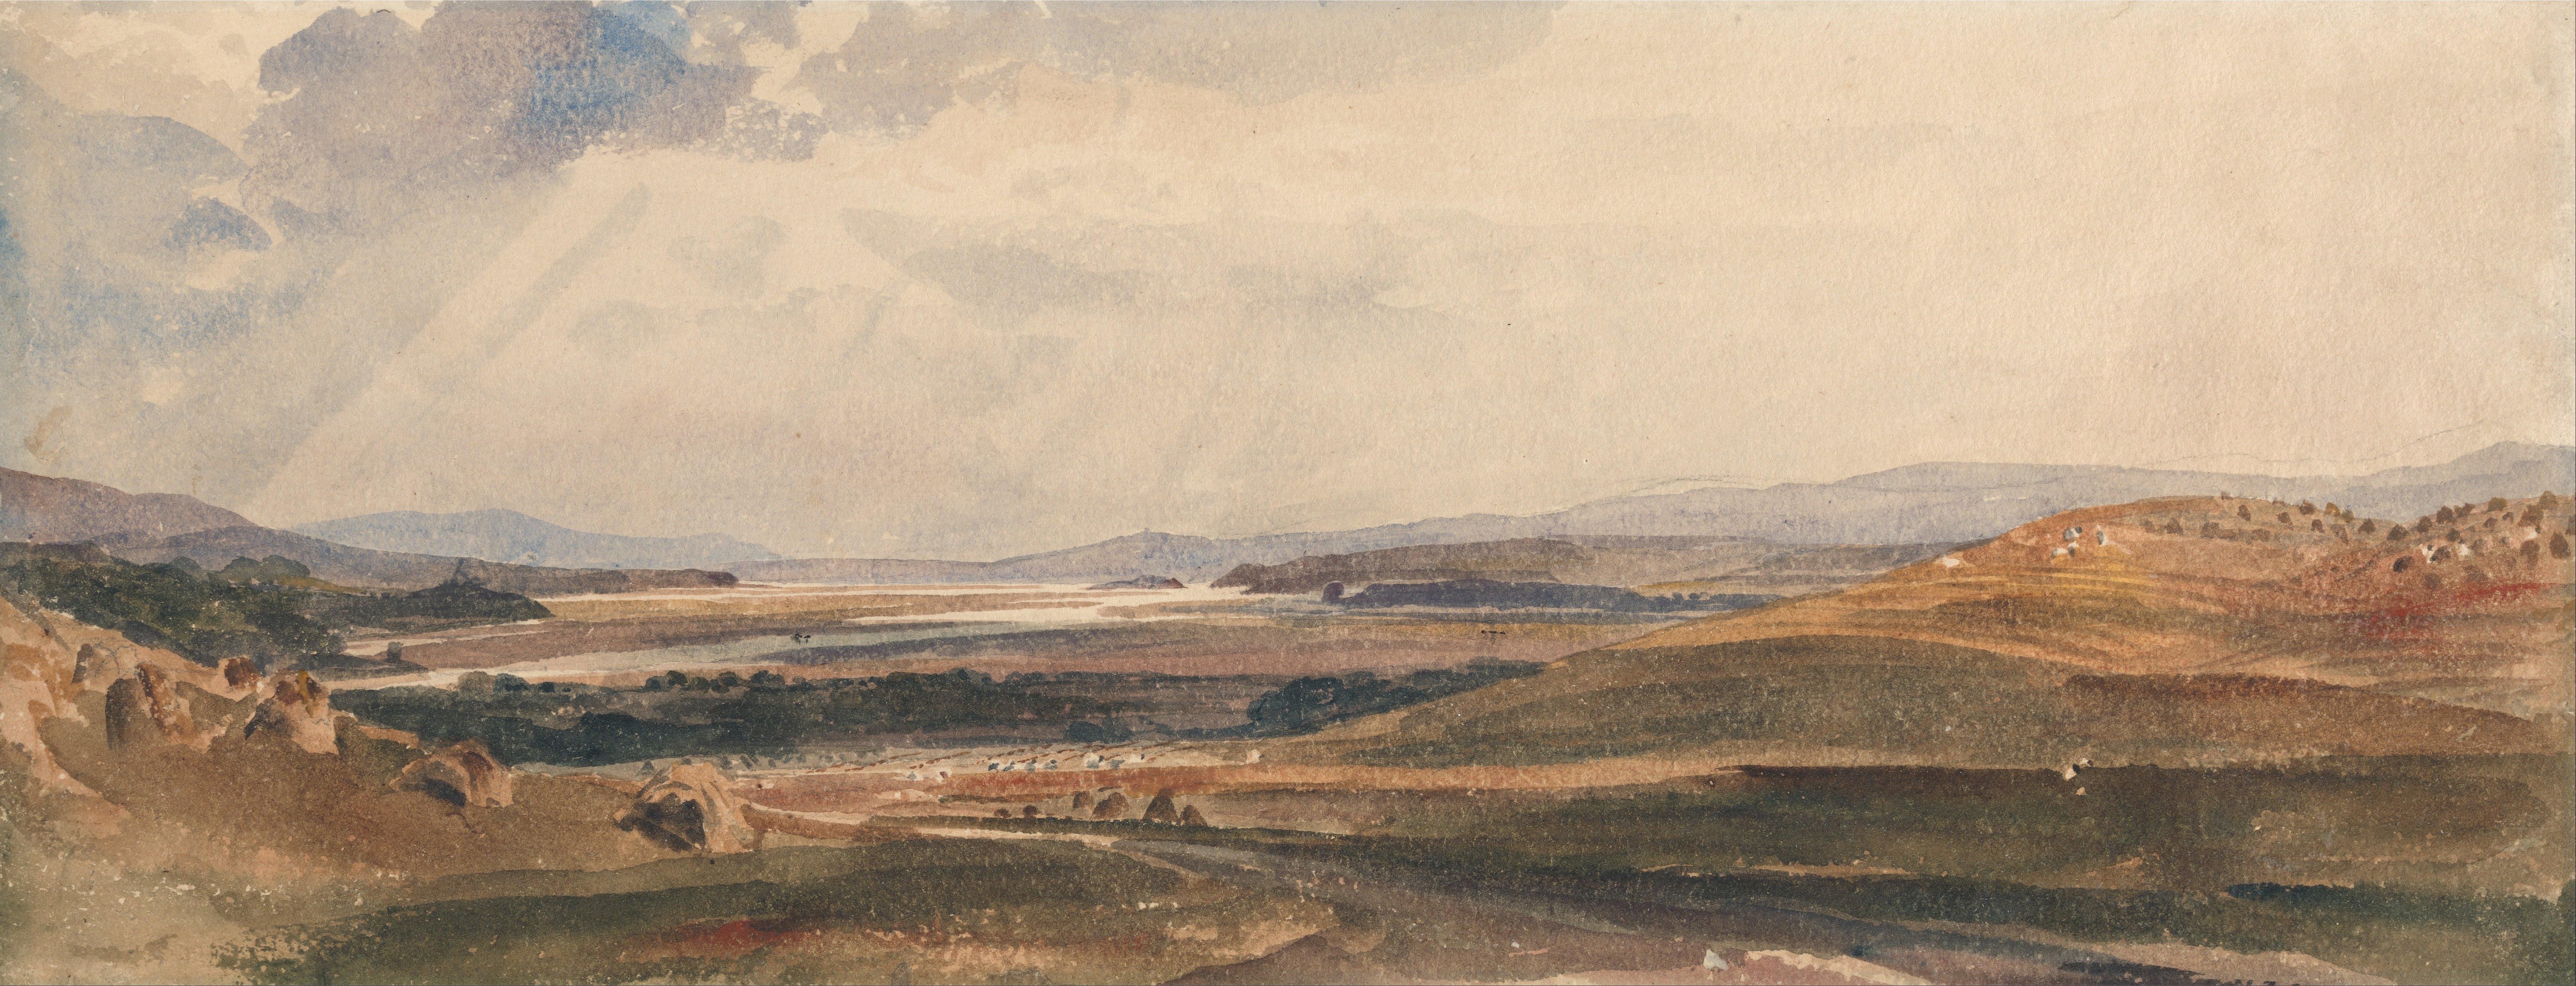 File:Peter DeWint - Harvest Time- Cumberland - Google Art Project.jpg - Wikimedia Commons